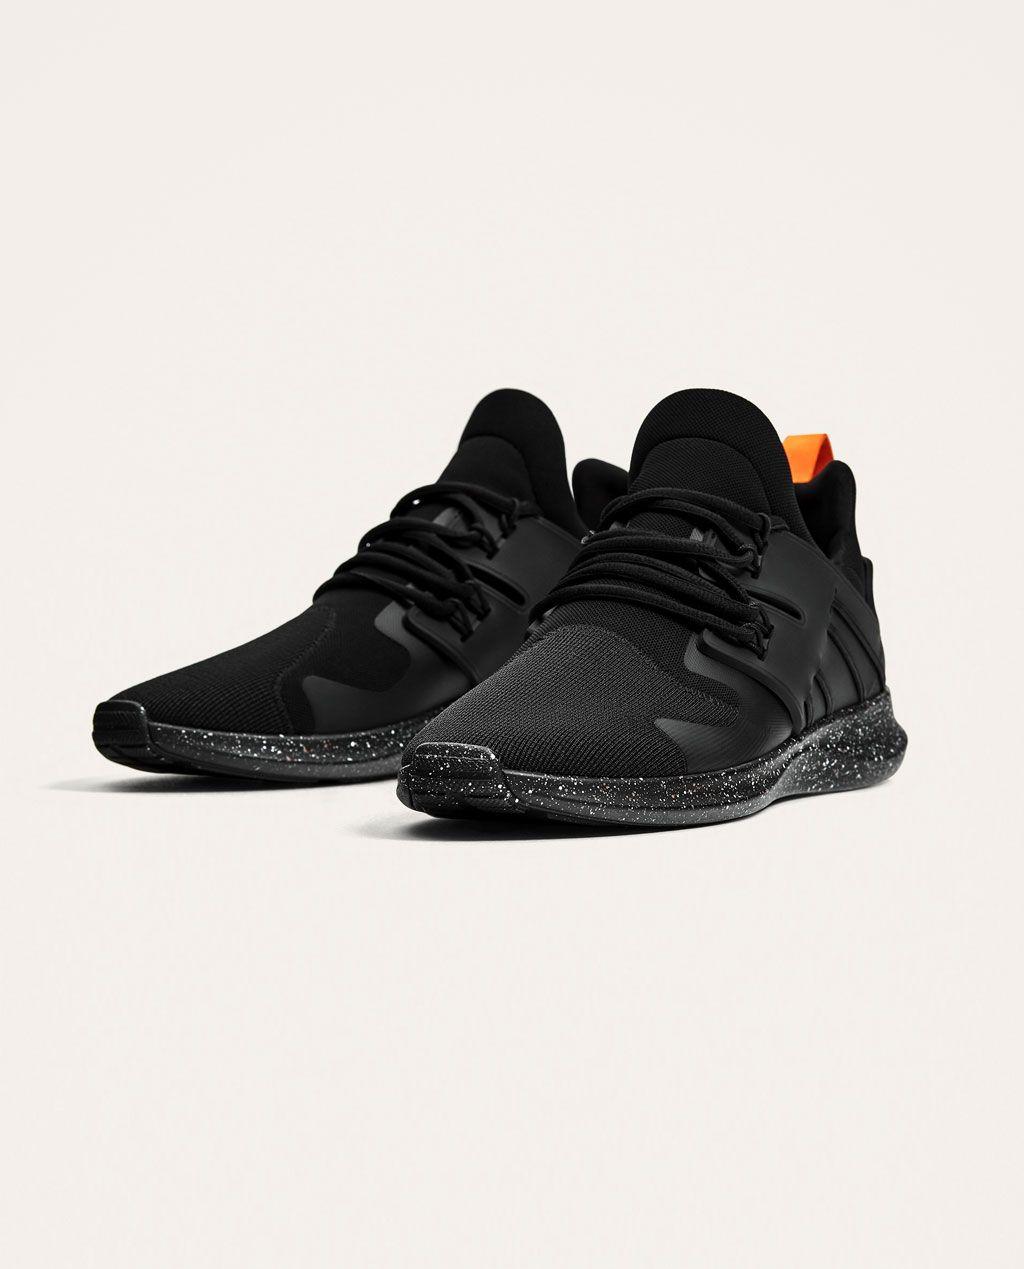 BLACK SNEAKERS WITH PRINTED SOLES-BEST SELLERS-MAN  3aac721a245